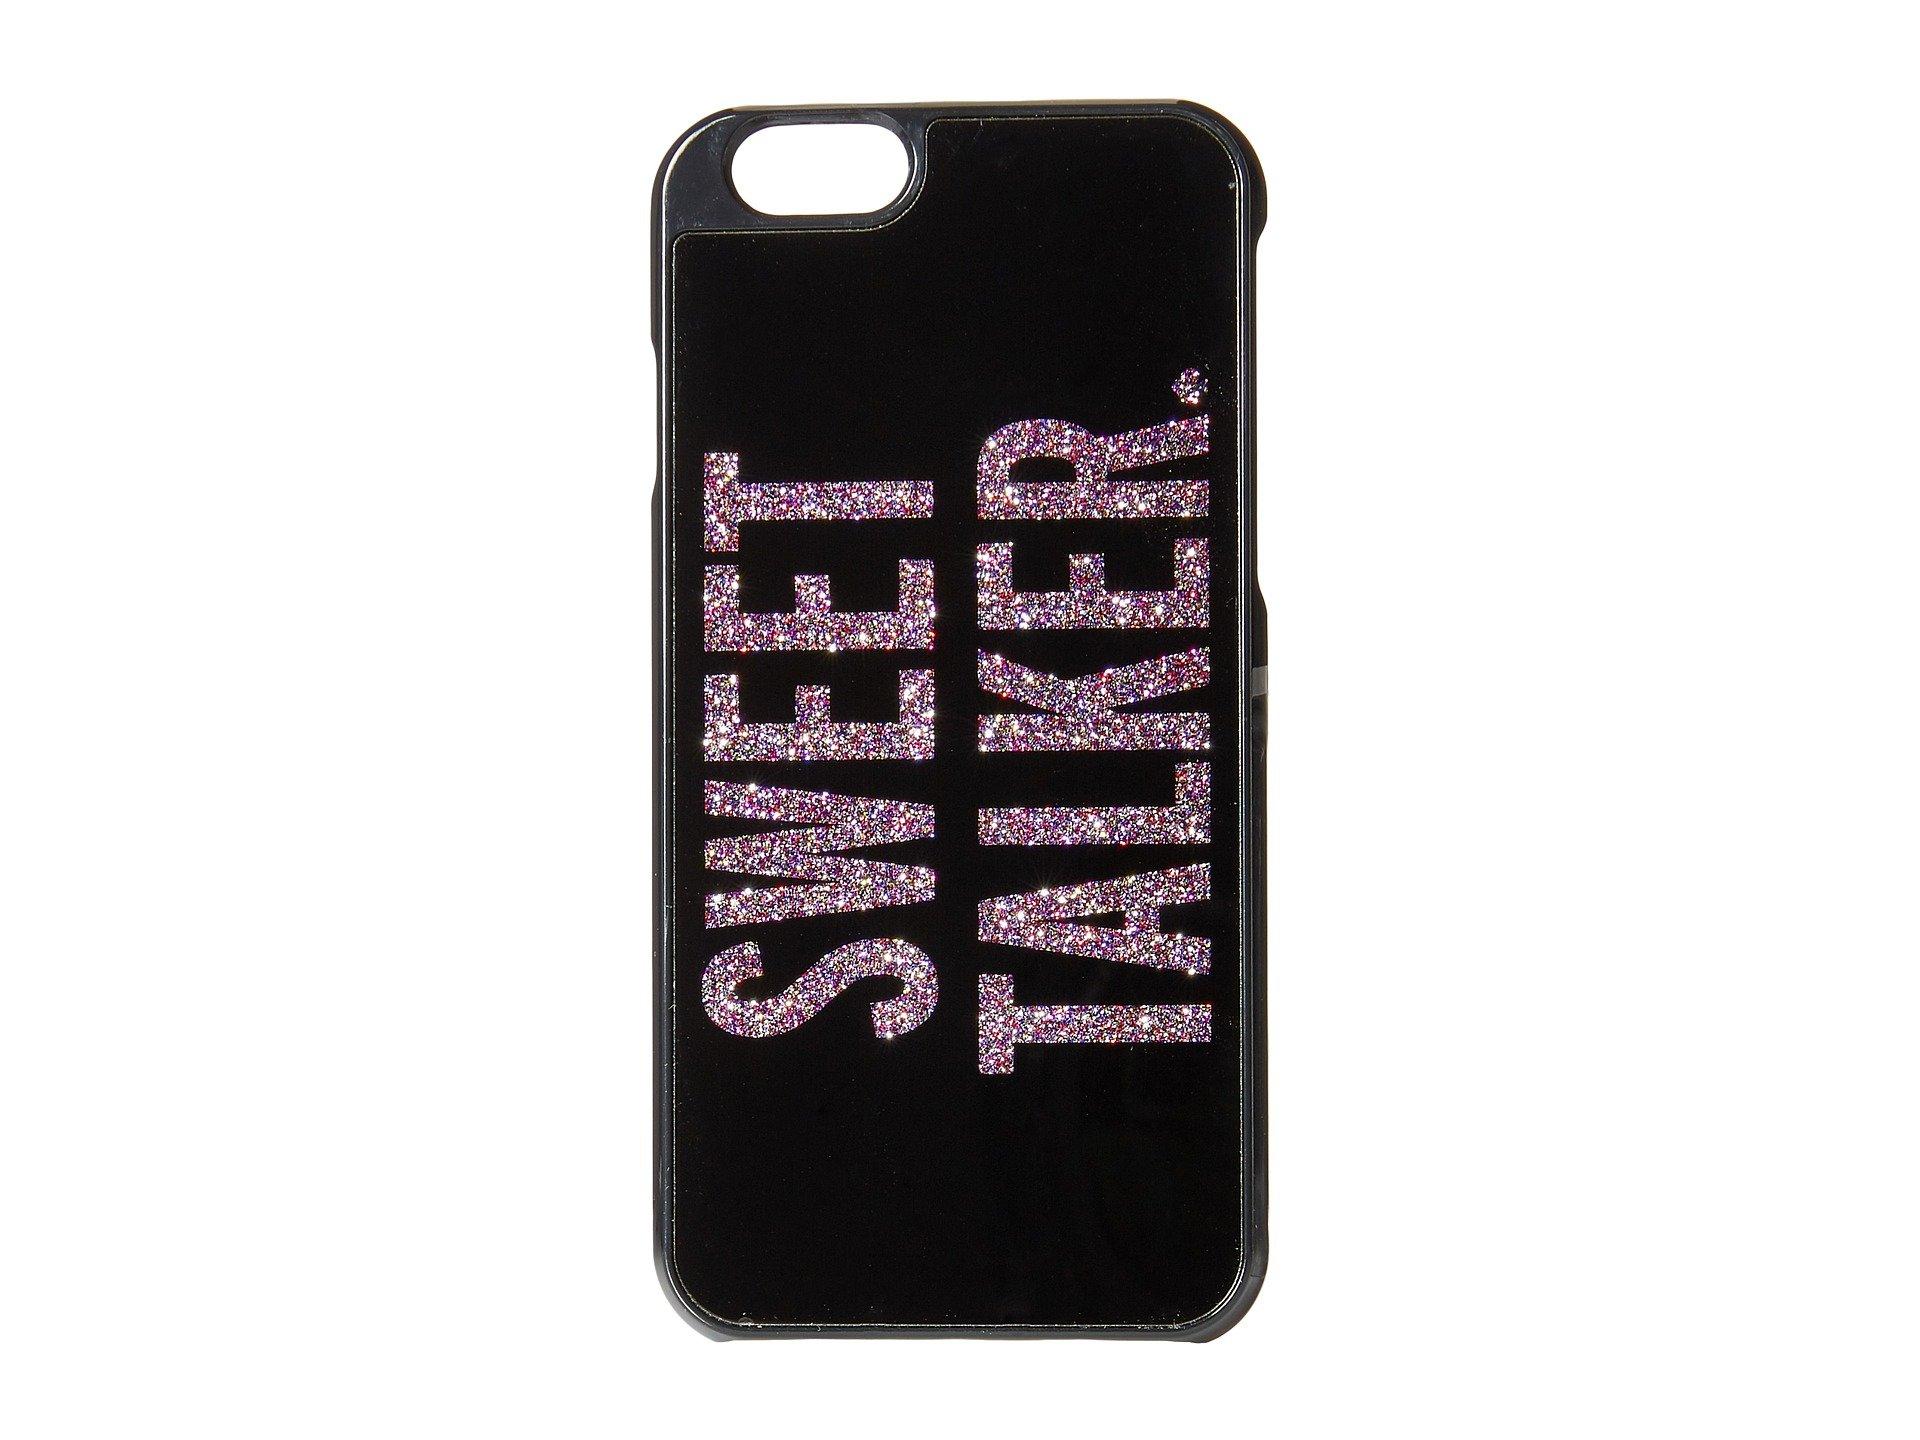 Accesorio para el Celular Kate Spade New York Sweet Talker Resin Phone 6 Case  + Kate Spade New York en VeoyCompro.net